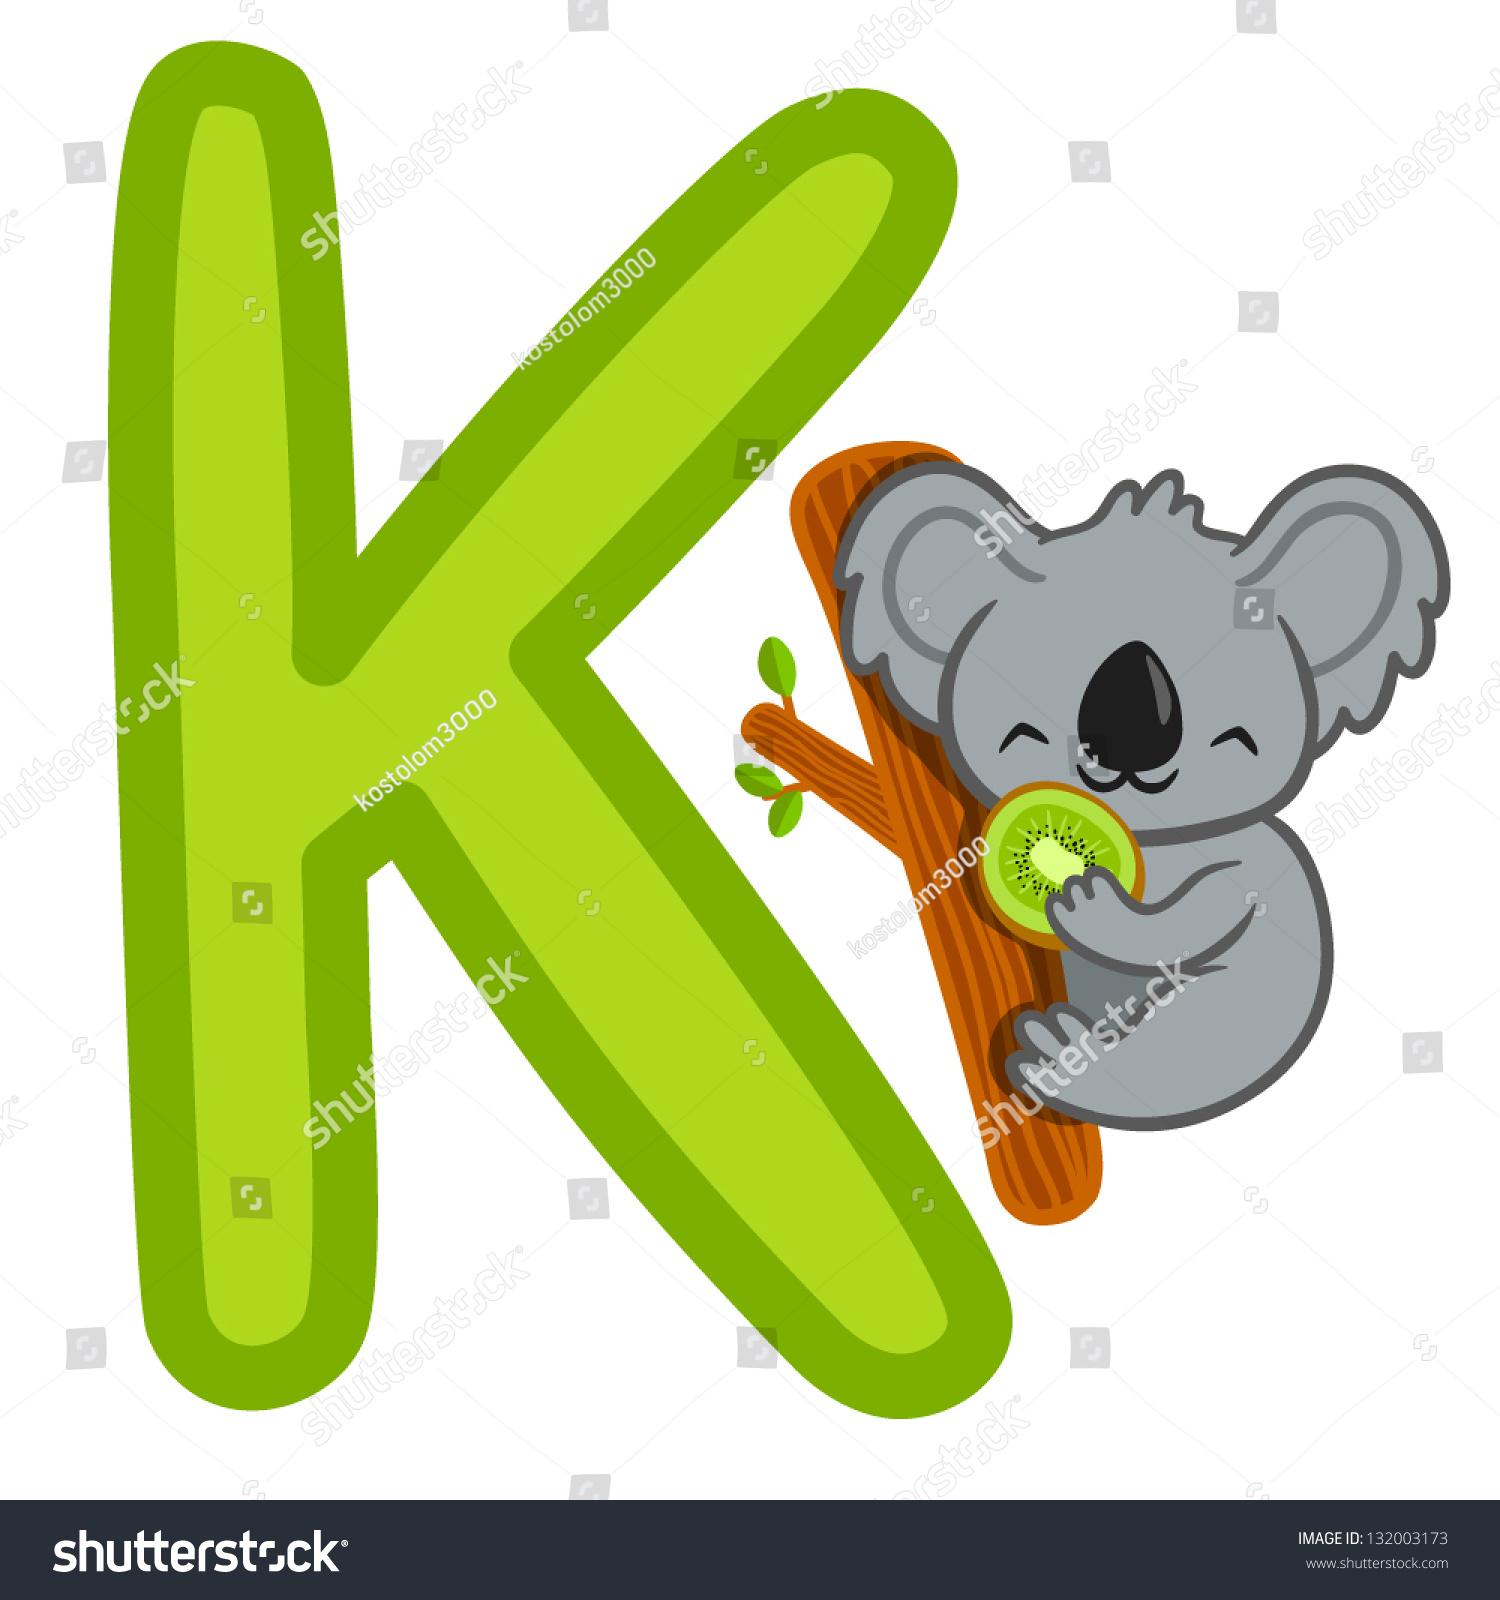 K Koala Kiwi Letter Funny Alphabet Stock Vector